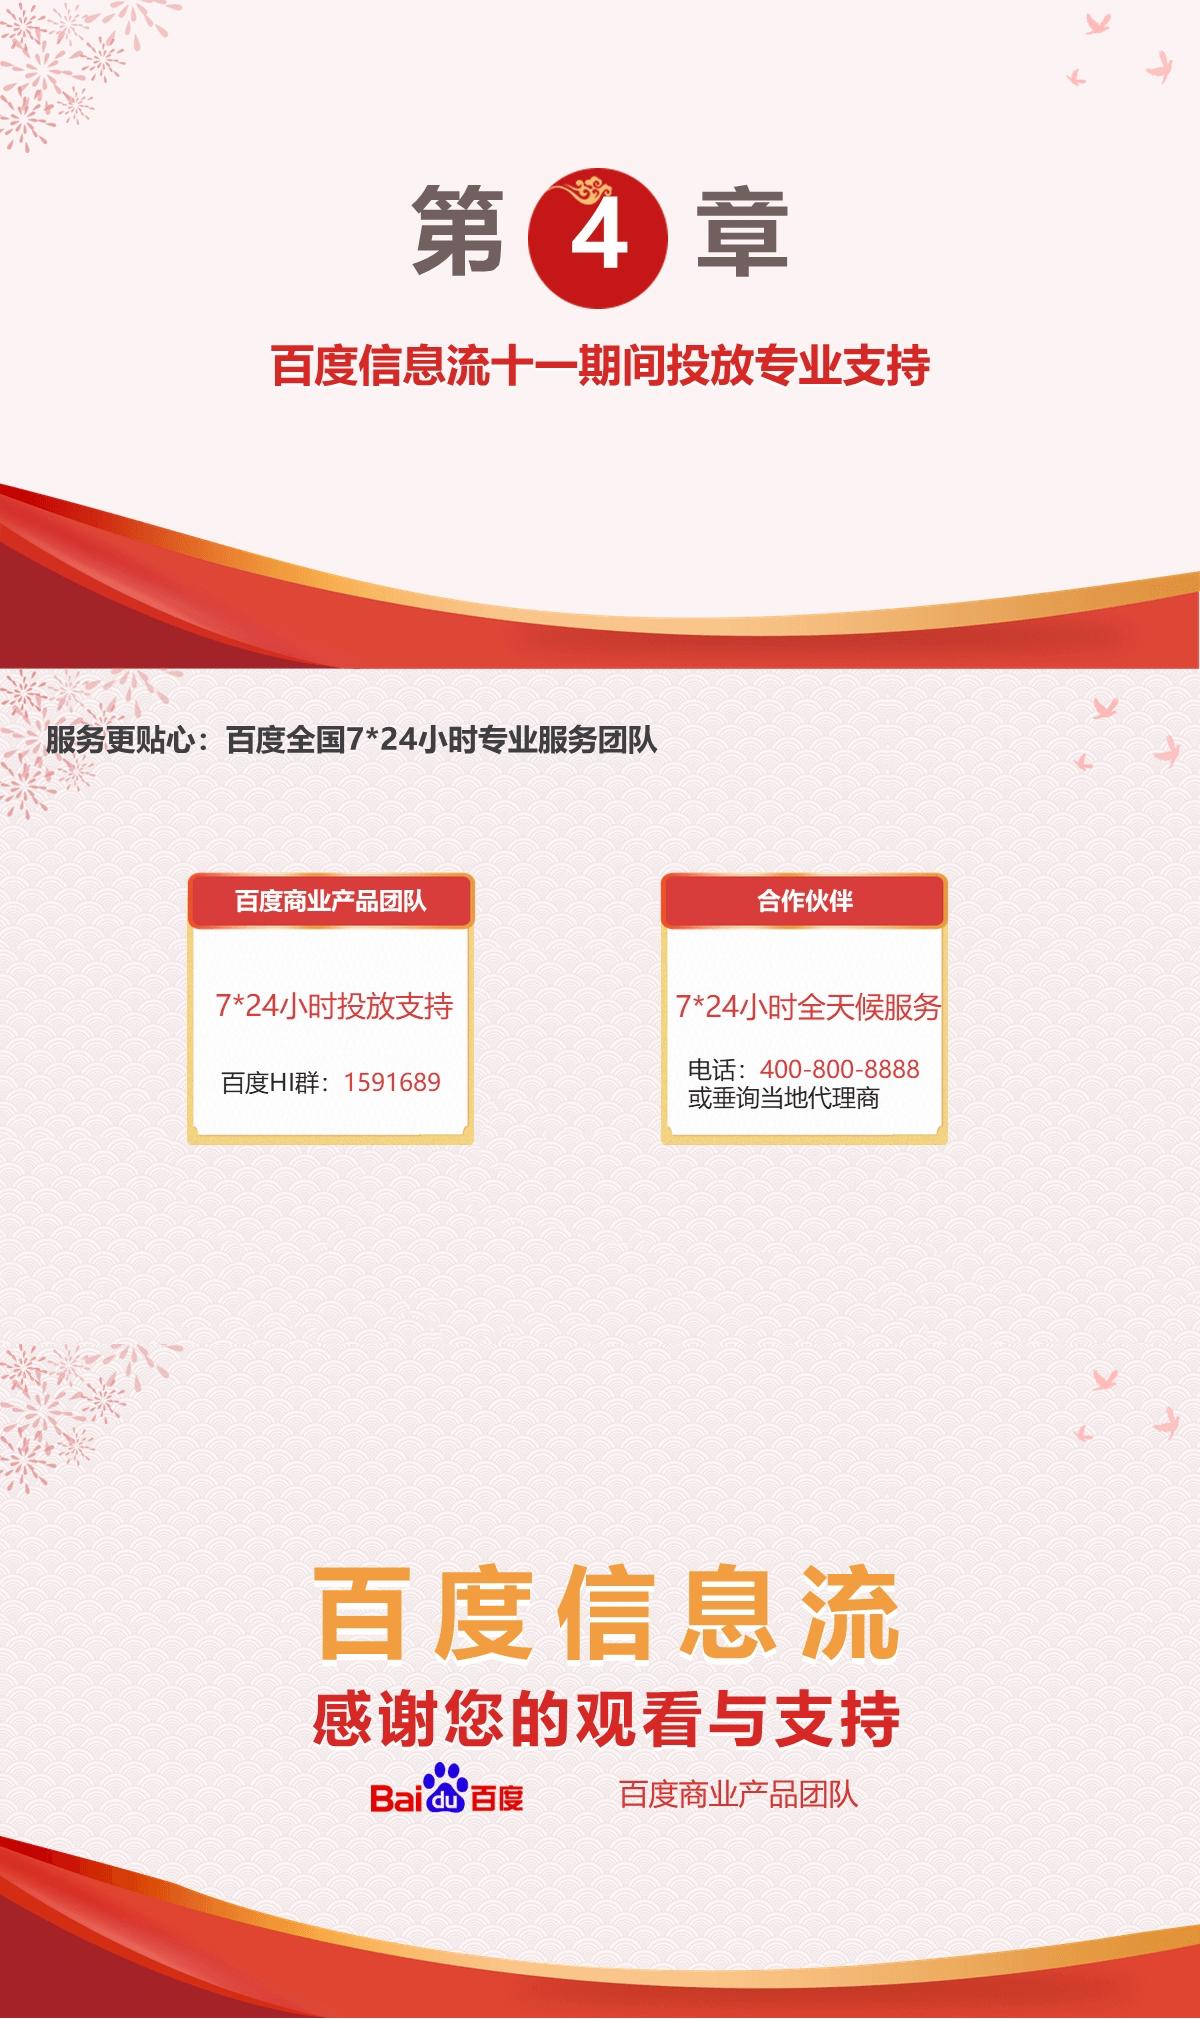 百度信息流-国庆投放指南finalV4的副本 3-4.png